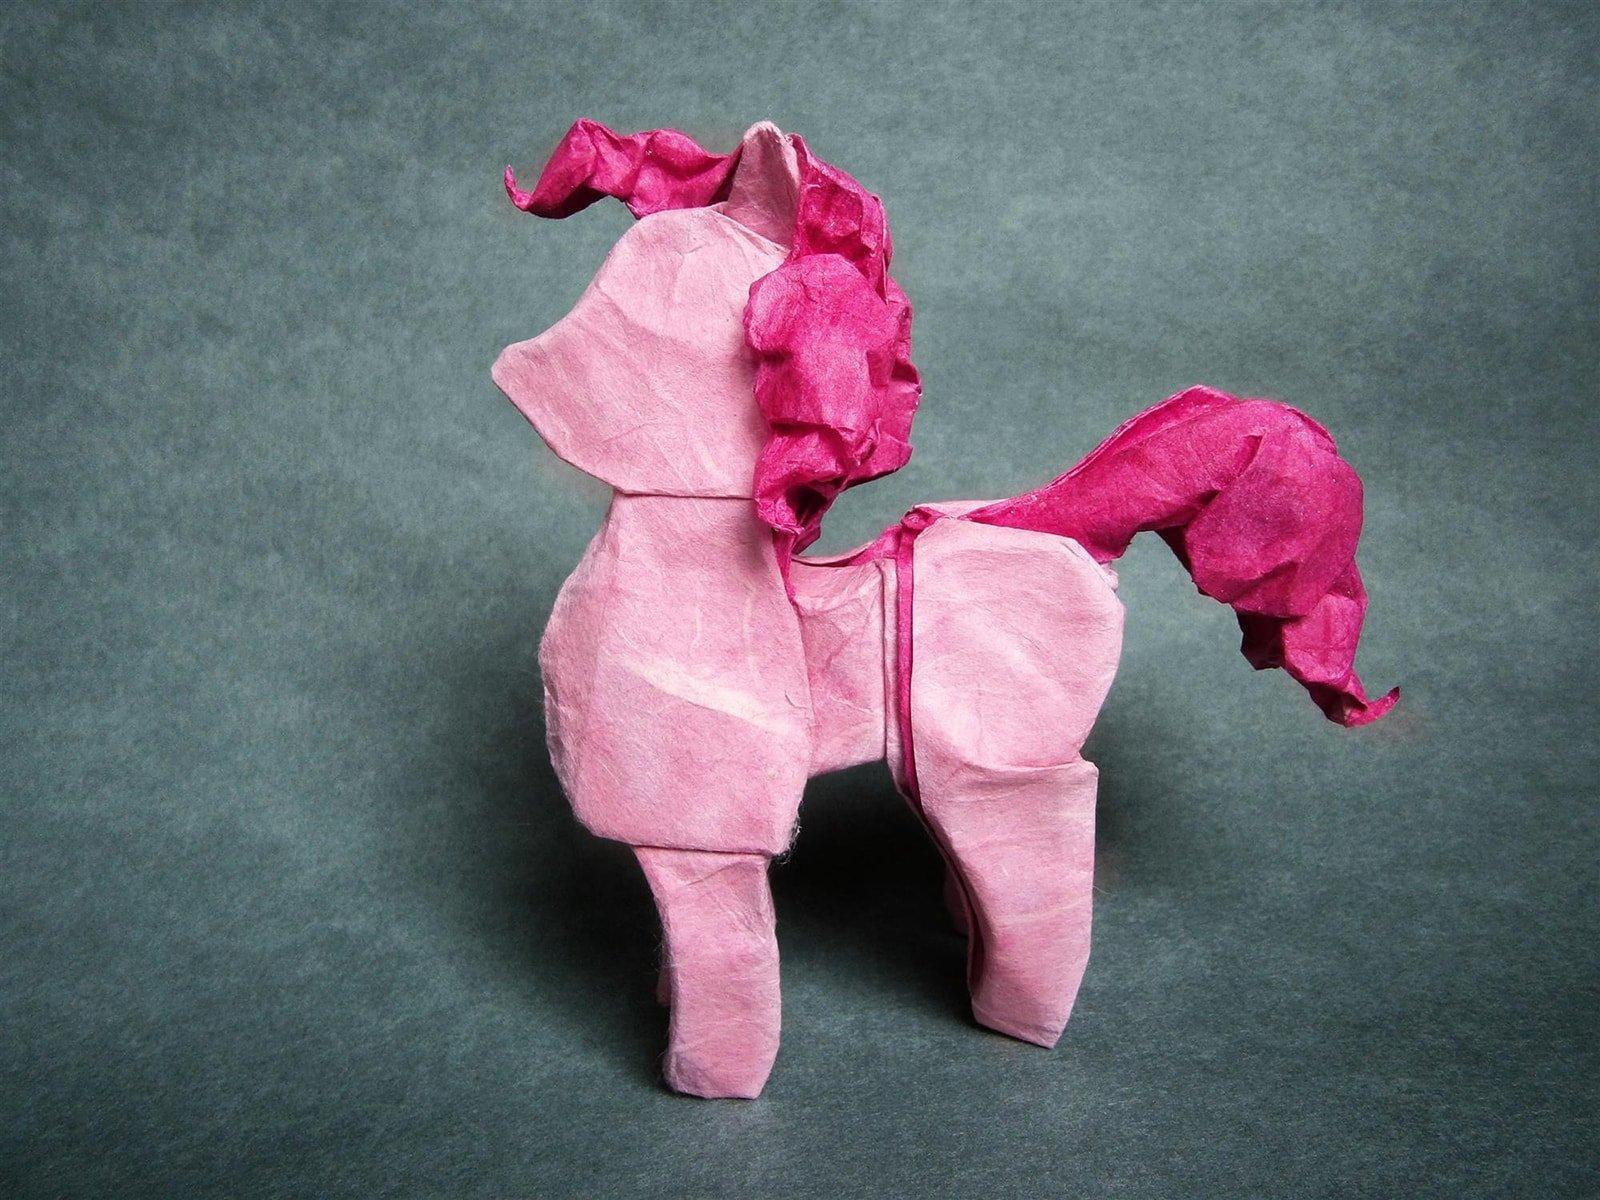 my little pony rainbow dash paper model paper-replika instructions